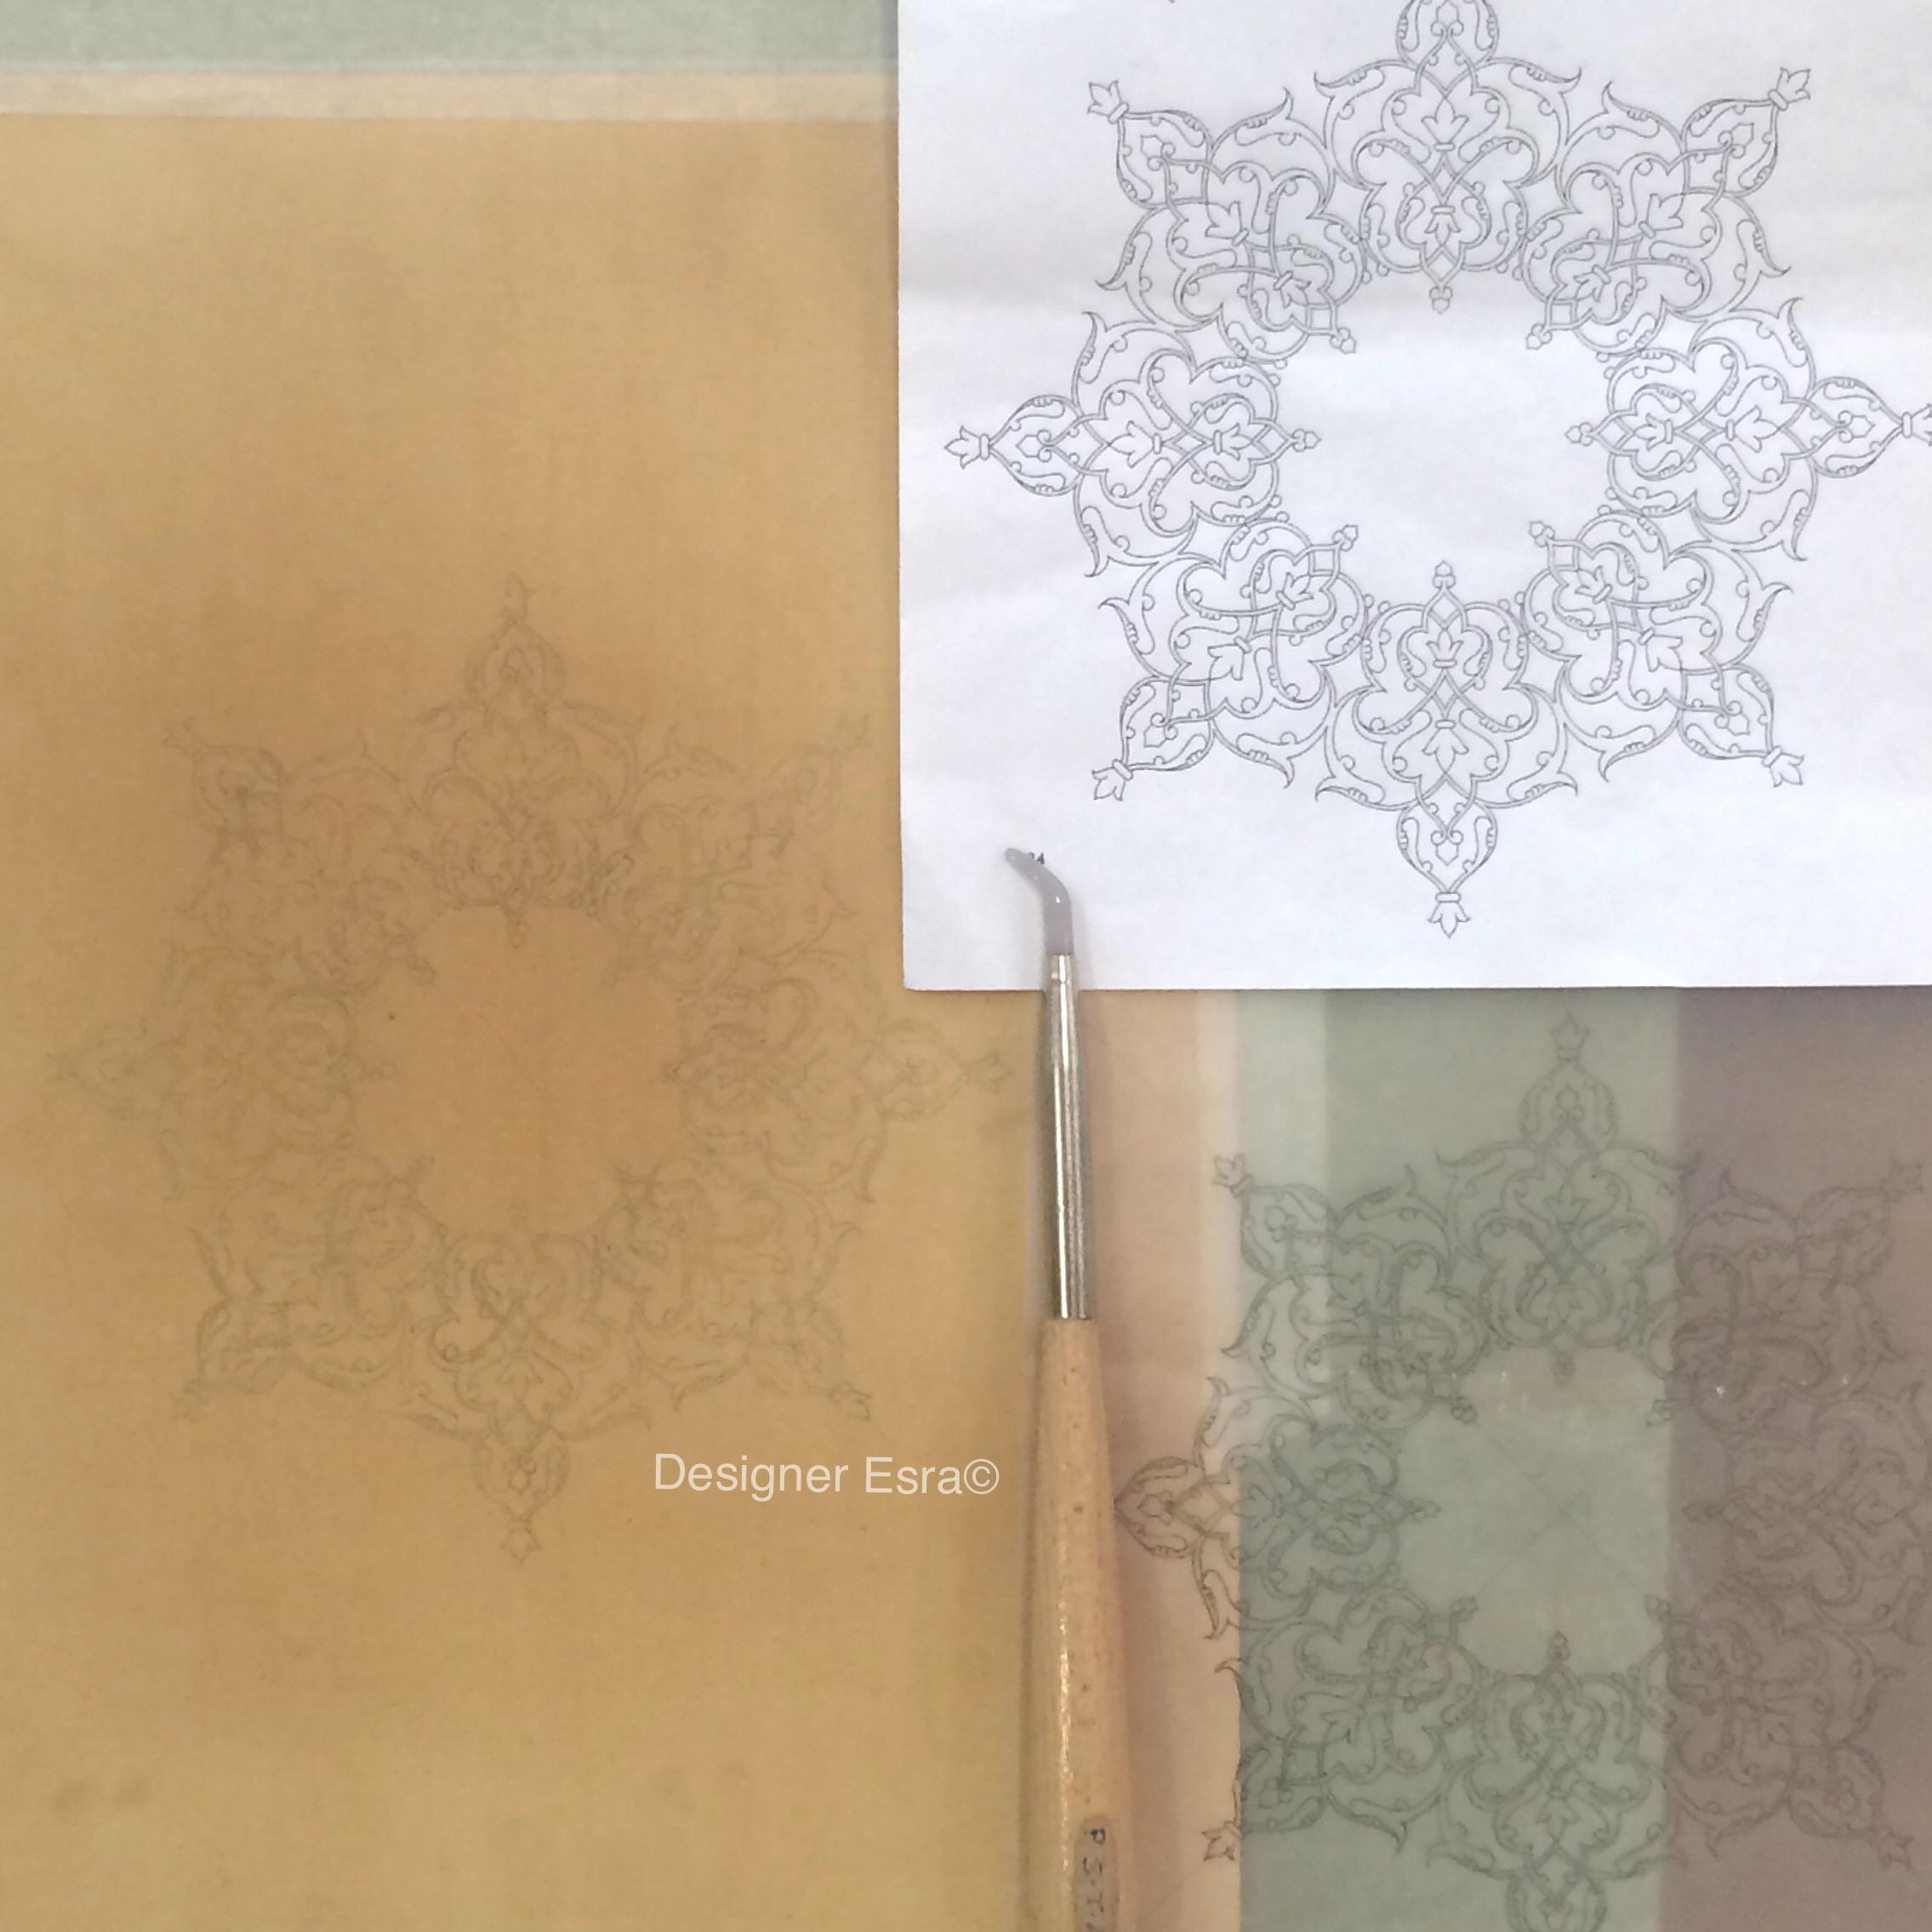 Persian Islimi design for Islamic illumination